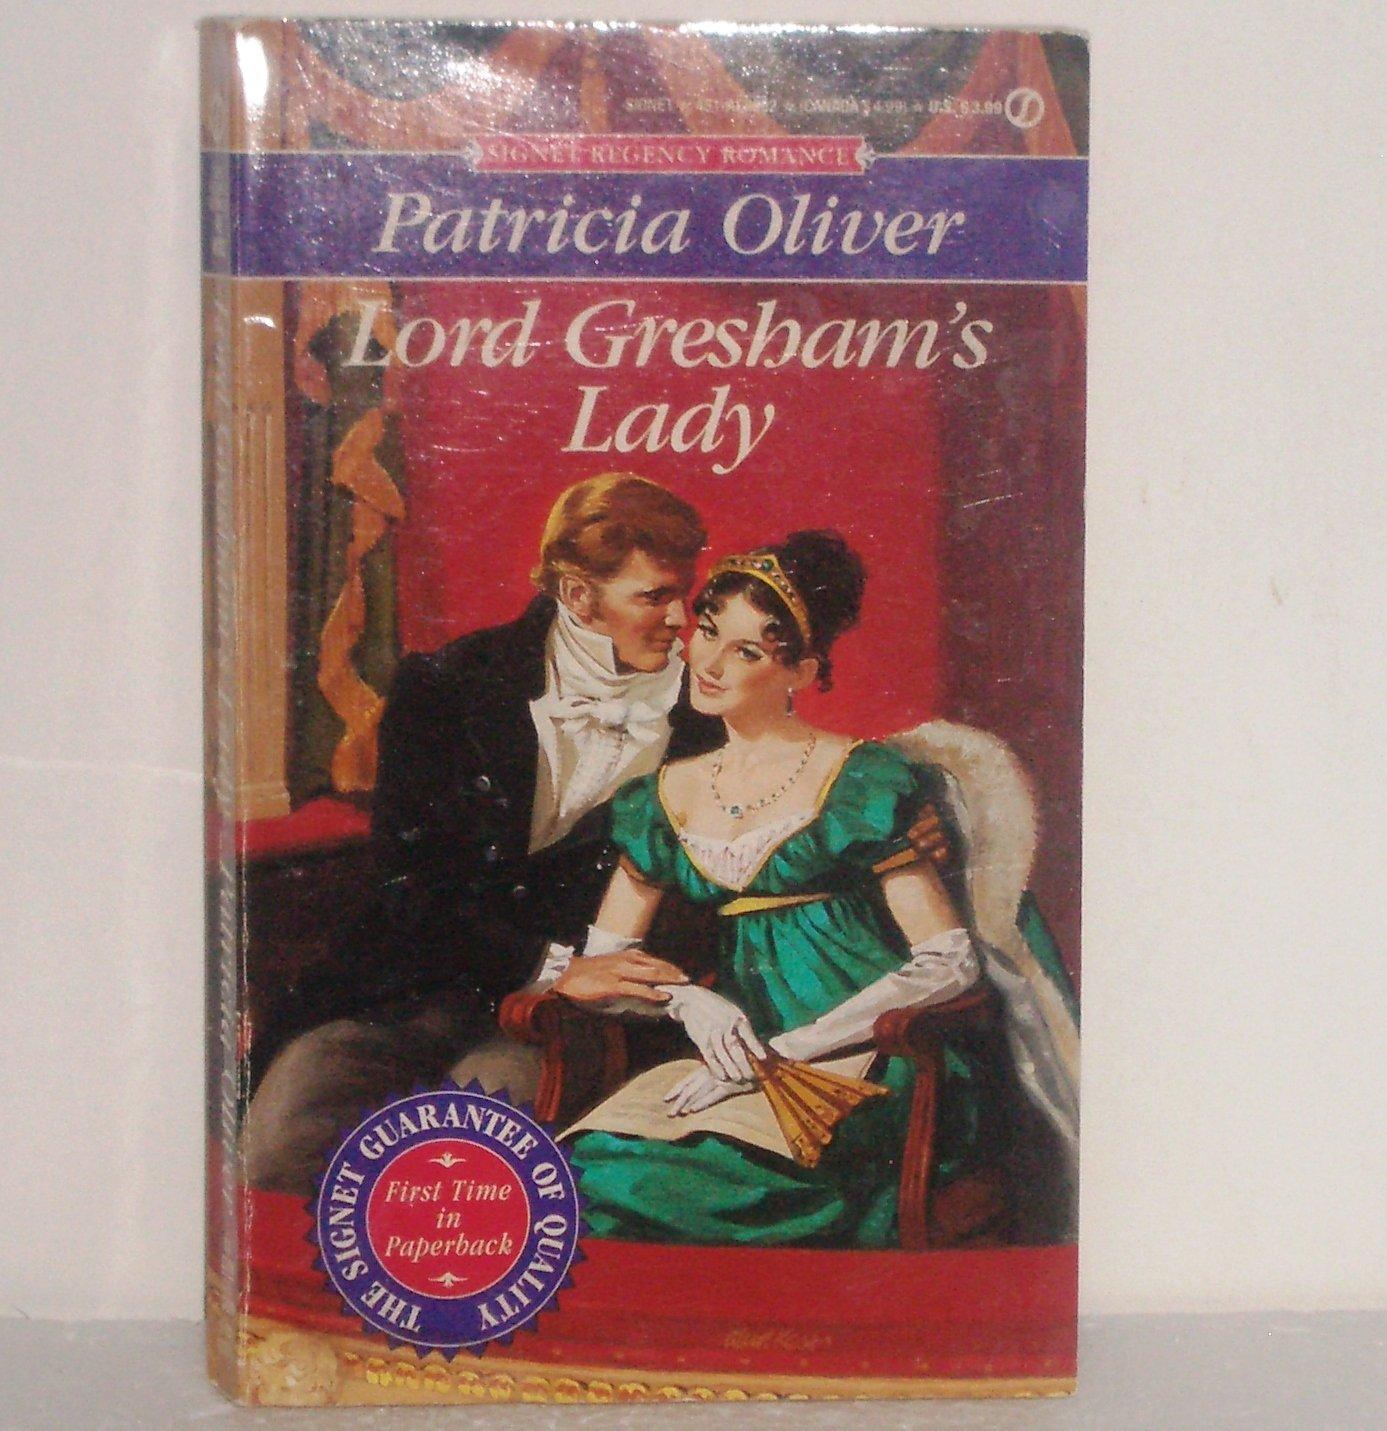 Lord Gresham's Lady by PATRICIA OLIVER Slim Signet Historical Regency Romance 1994